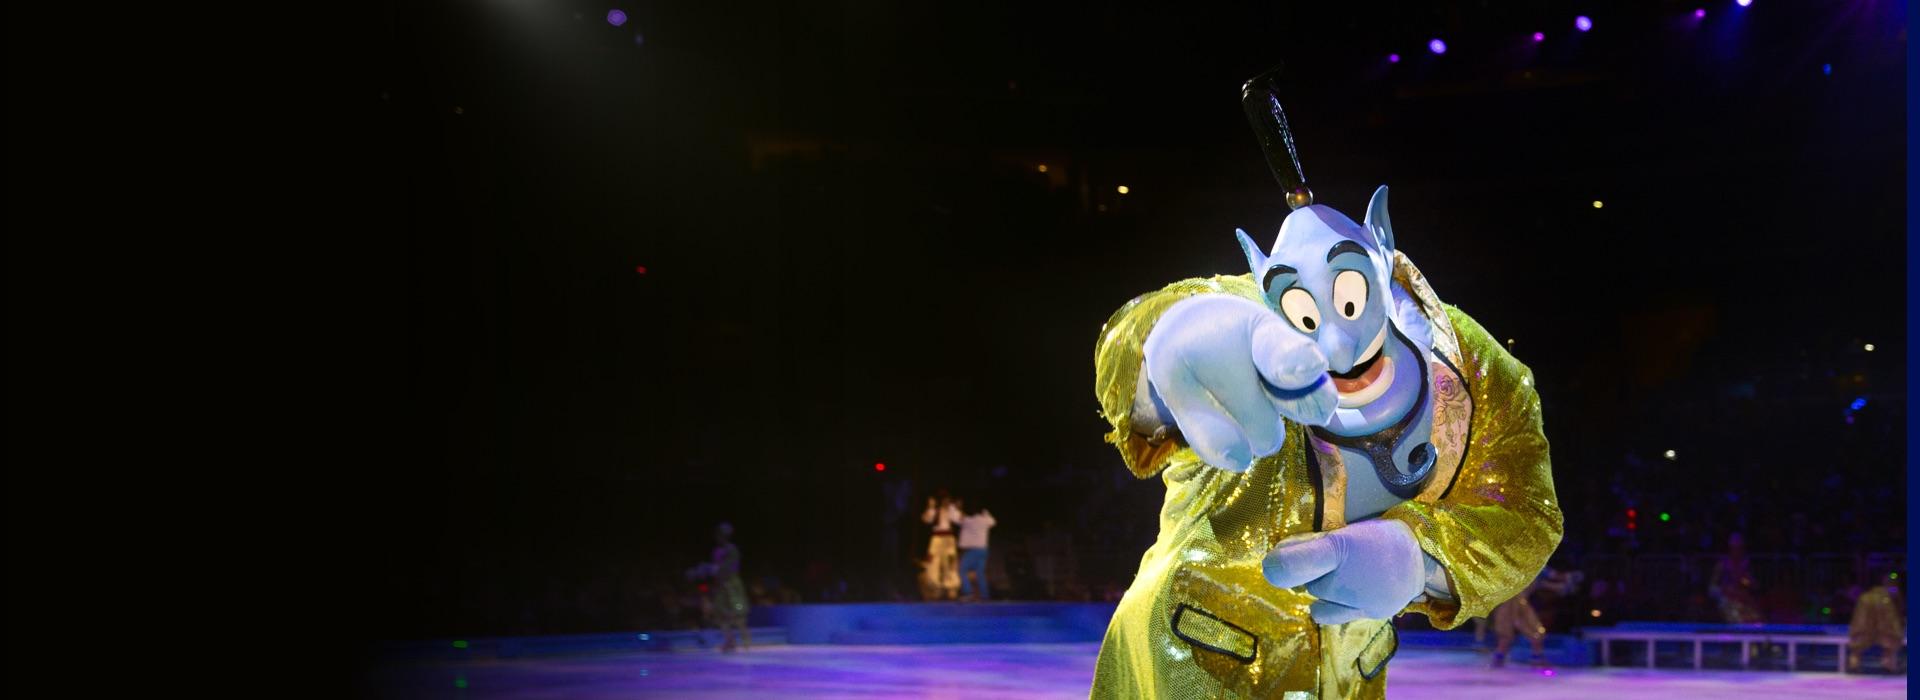 Mickey's Search Party Aladdin